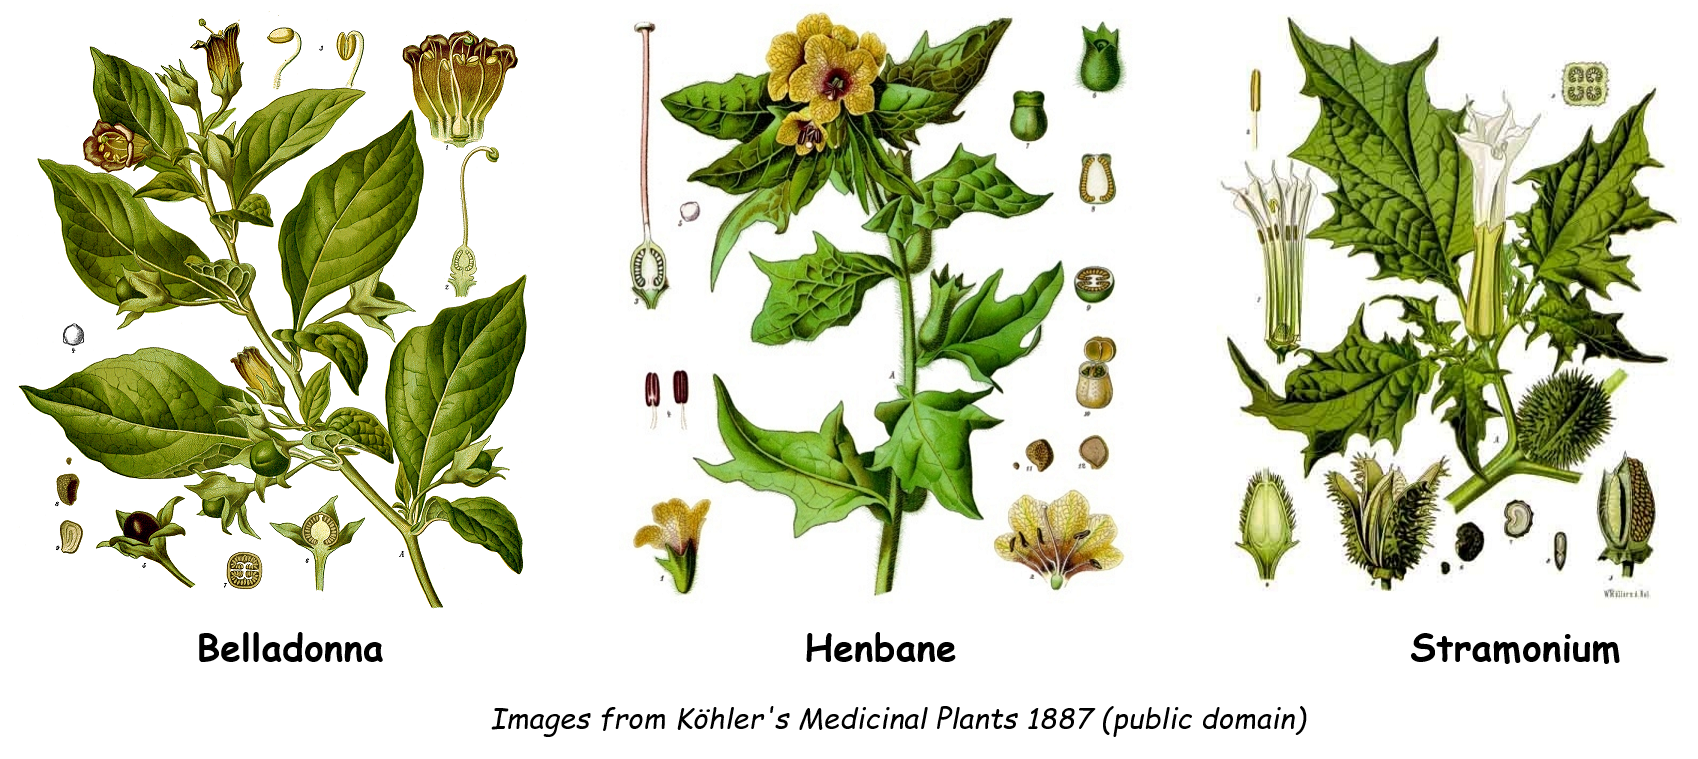 Henbane, belladonna and stramonium plants